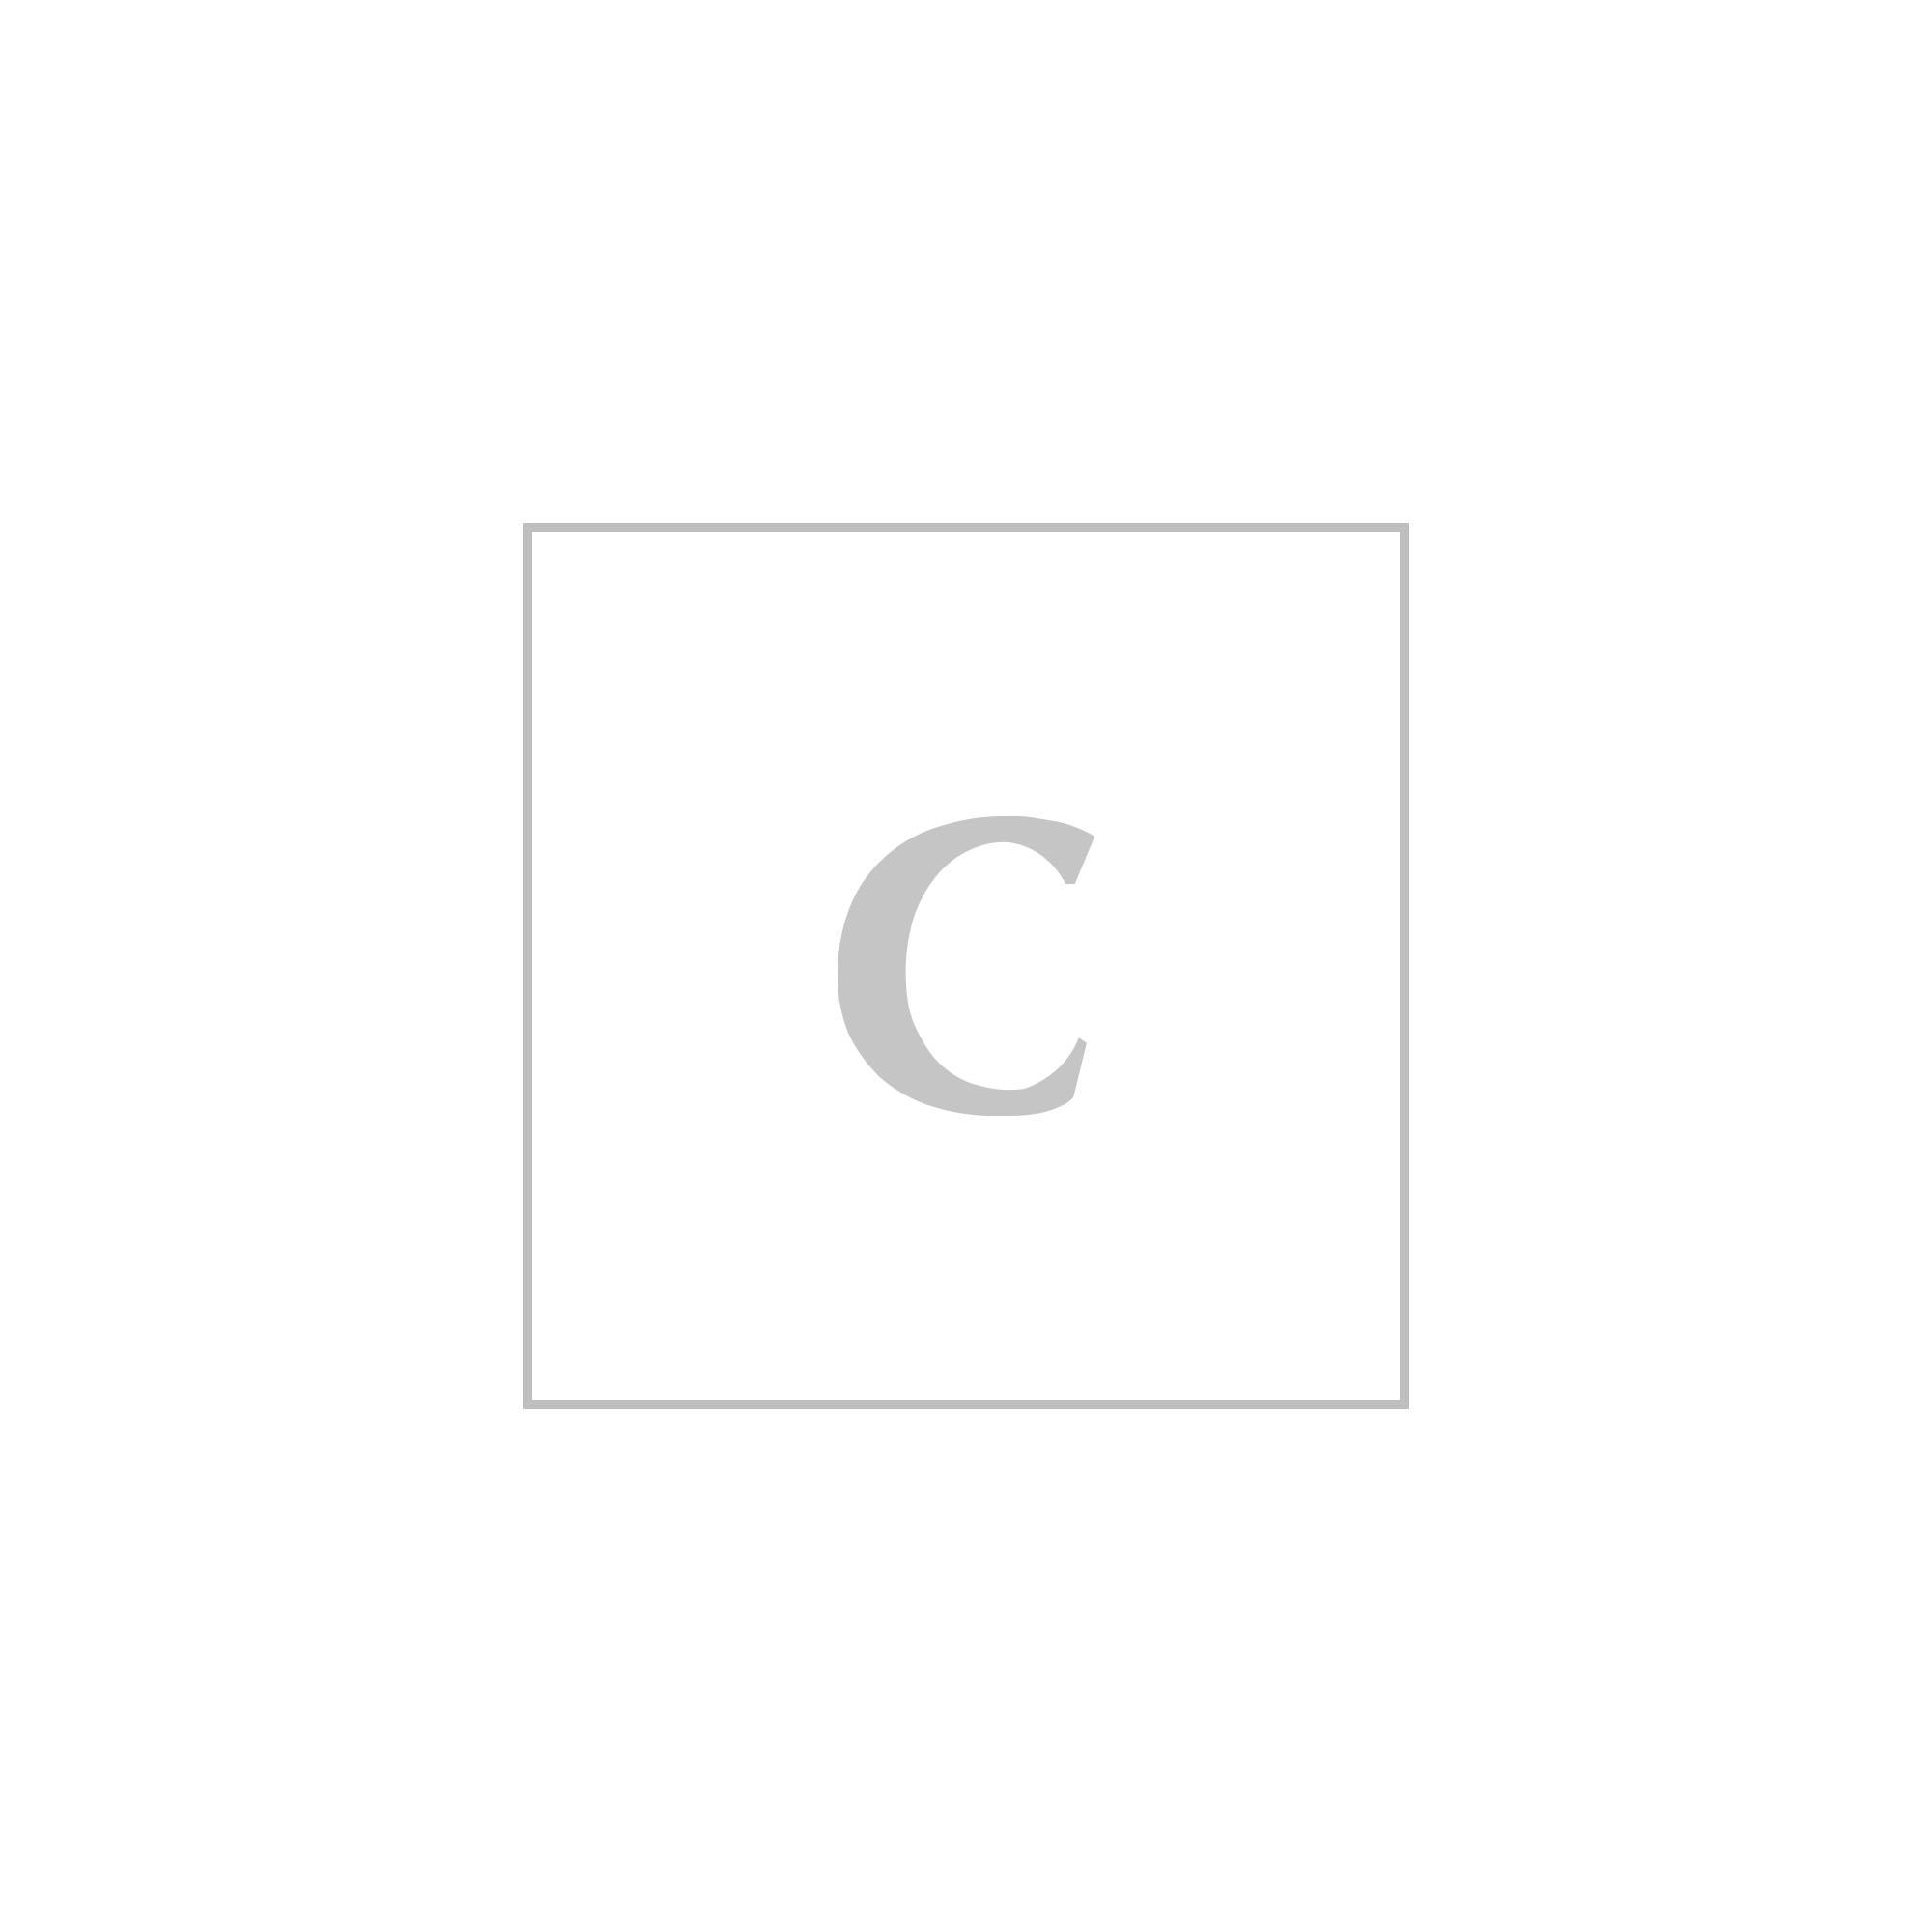 Burberry cotswold belt